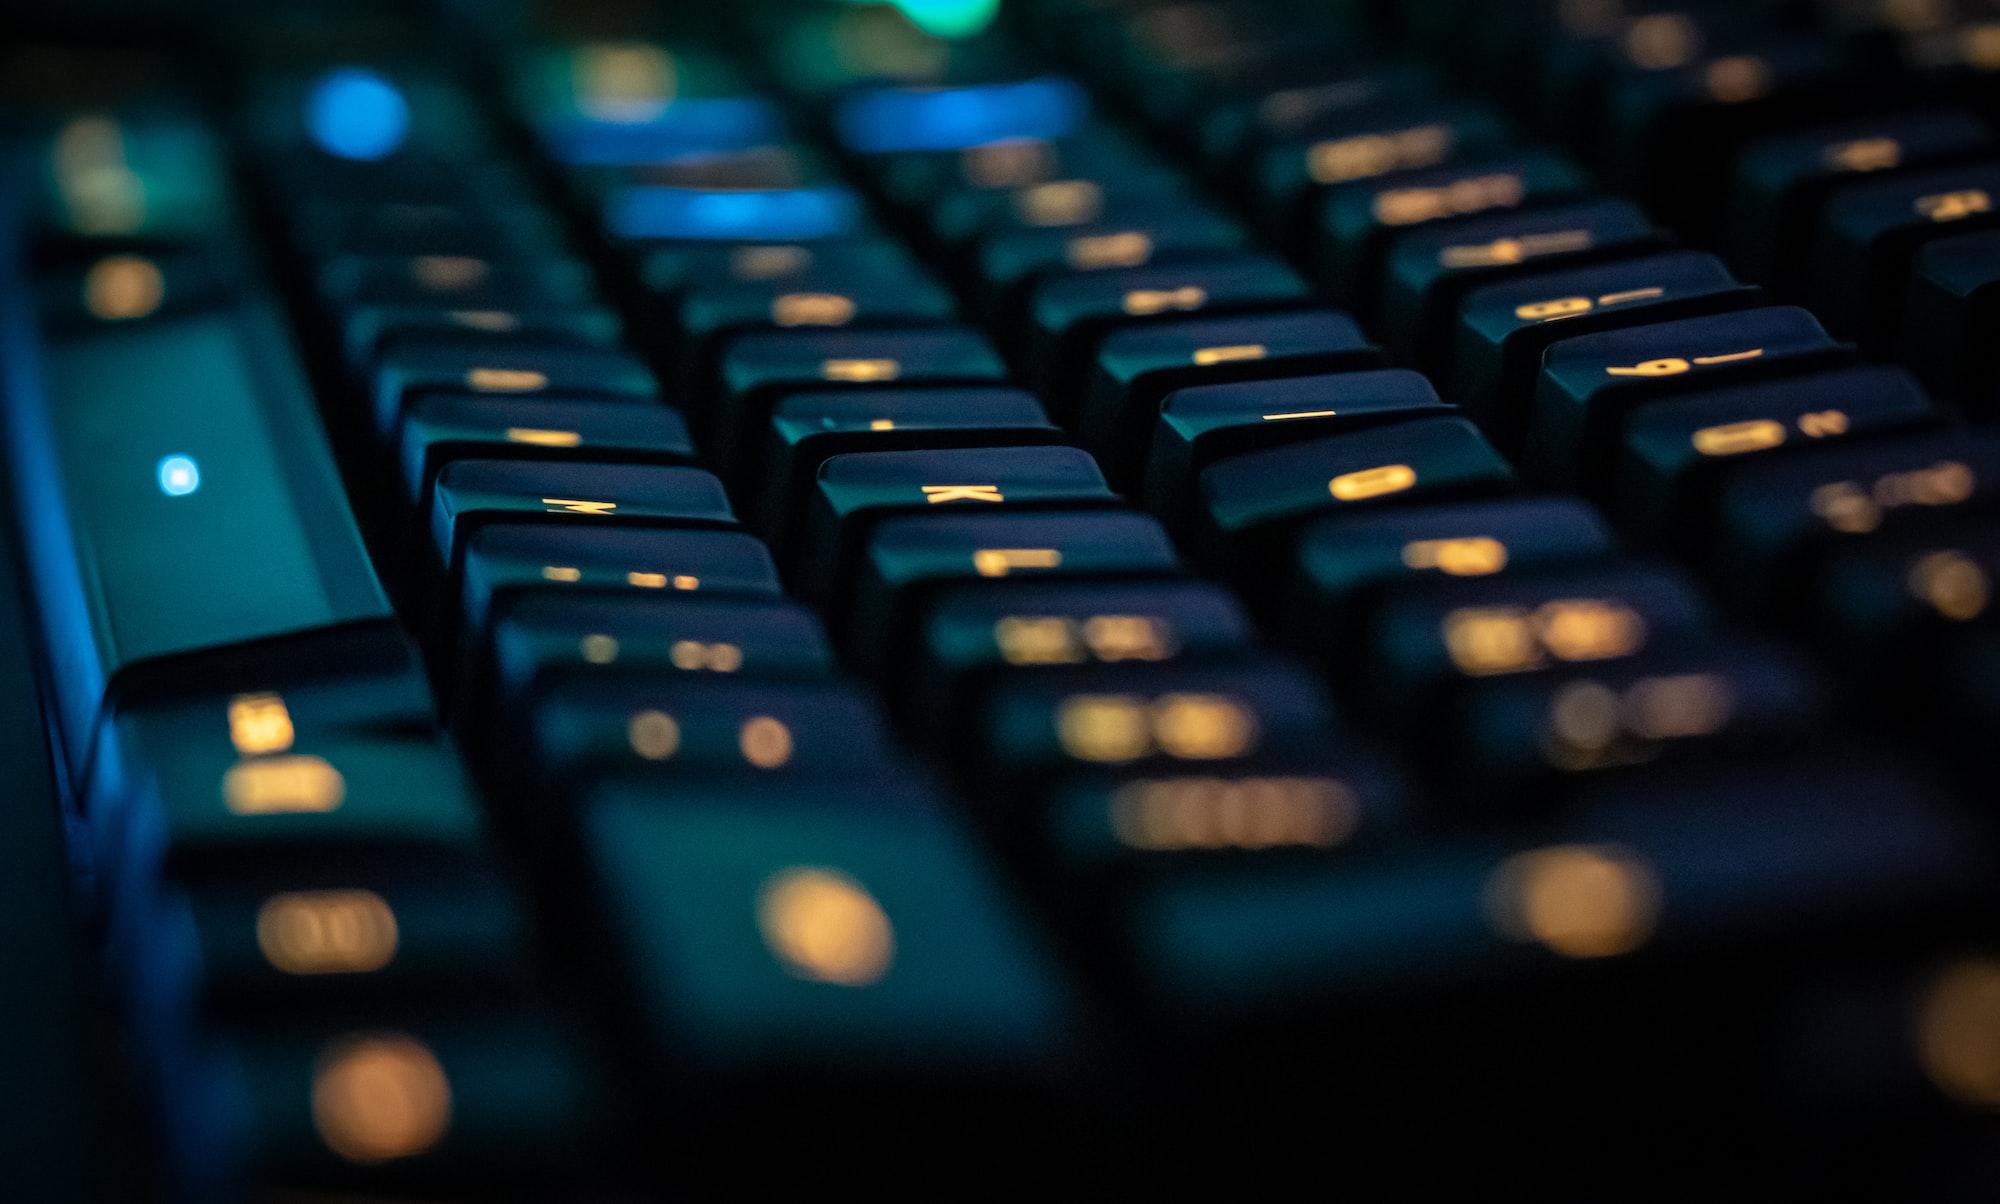 Delete Activision account using GDPR (Right To Erasure)